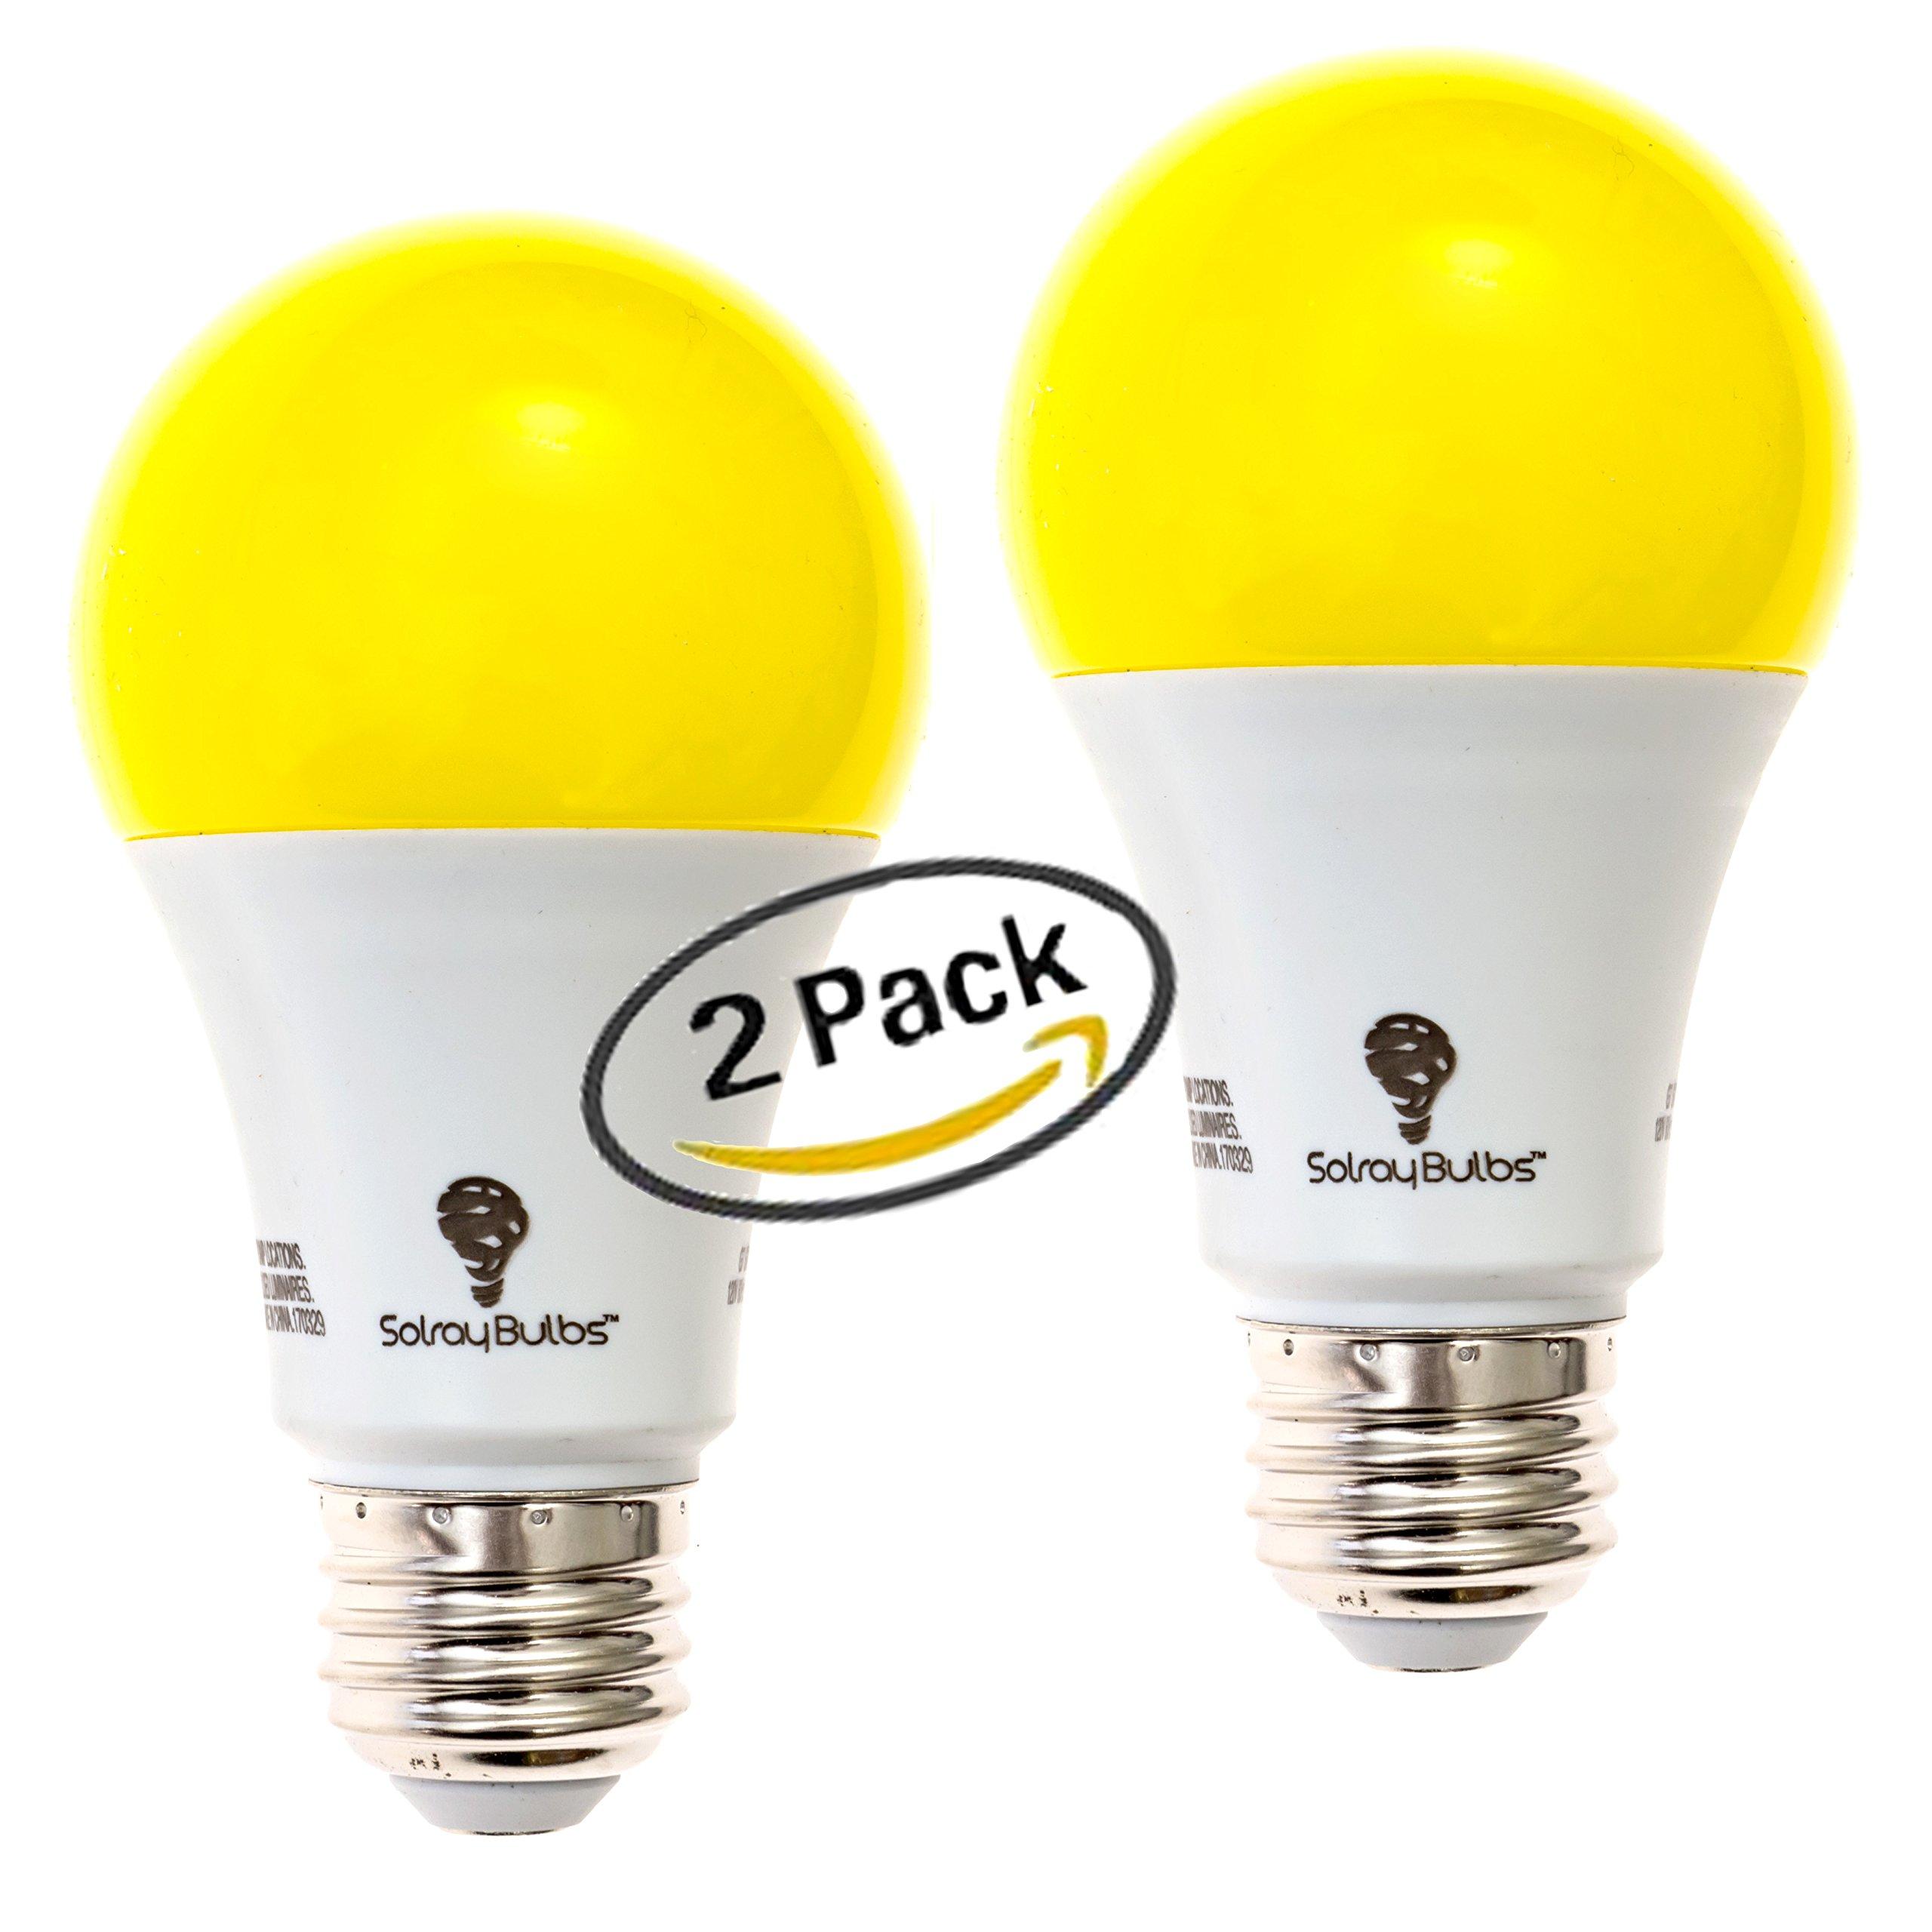 solray amber yellow led bug light bulb 2 pack no blue light outdoor 650 lumens 617395107445 ebay. Black Bedroom Furniture Sets. Home Design Ideas